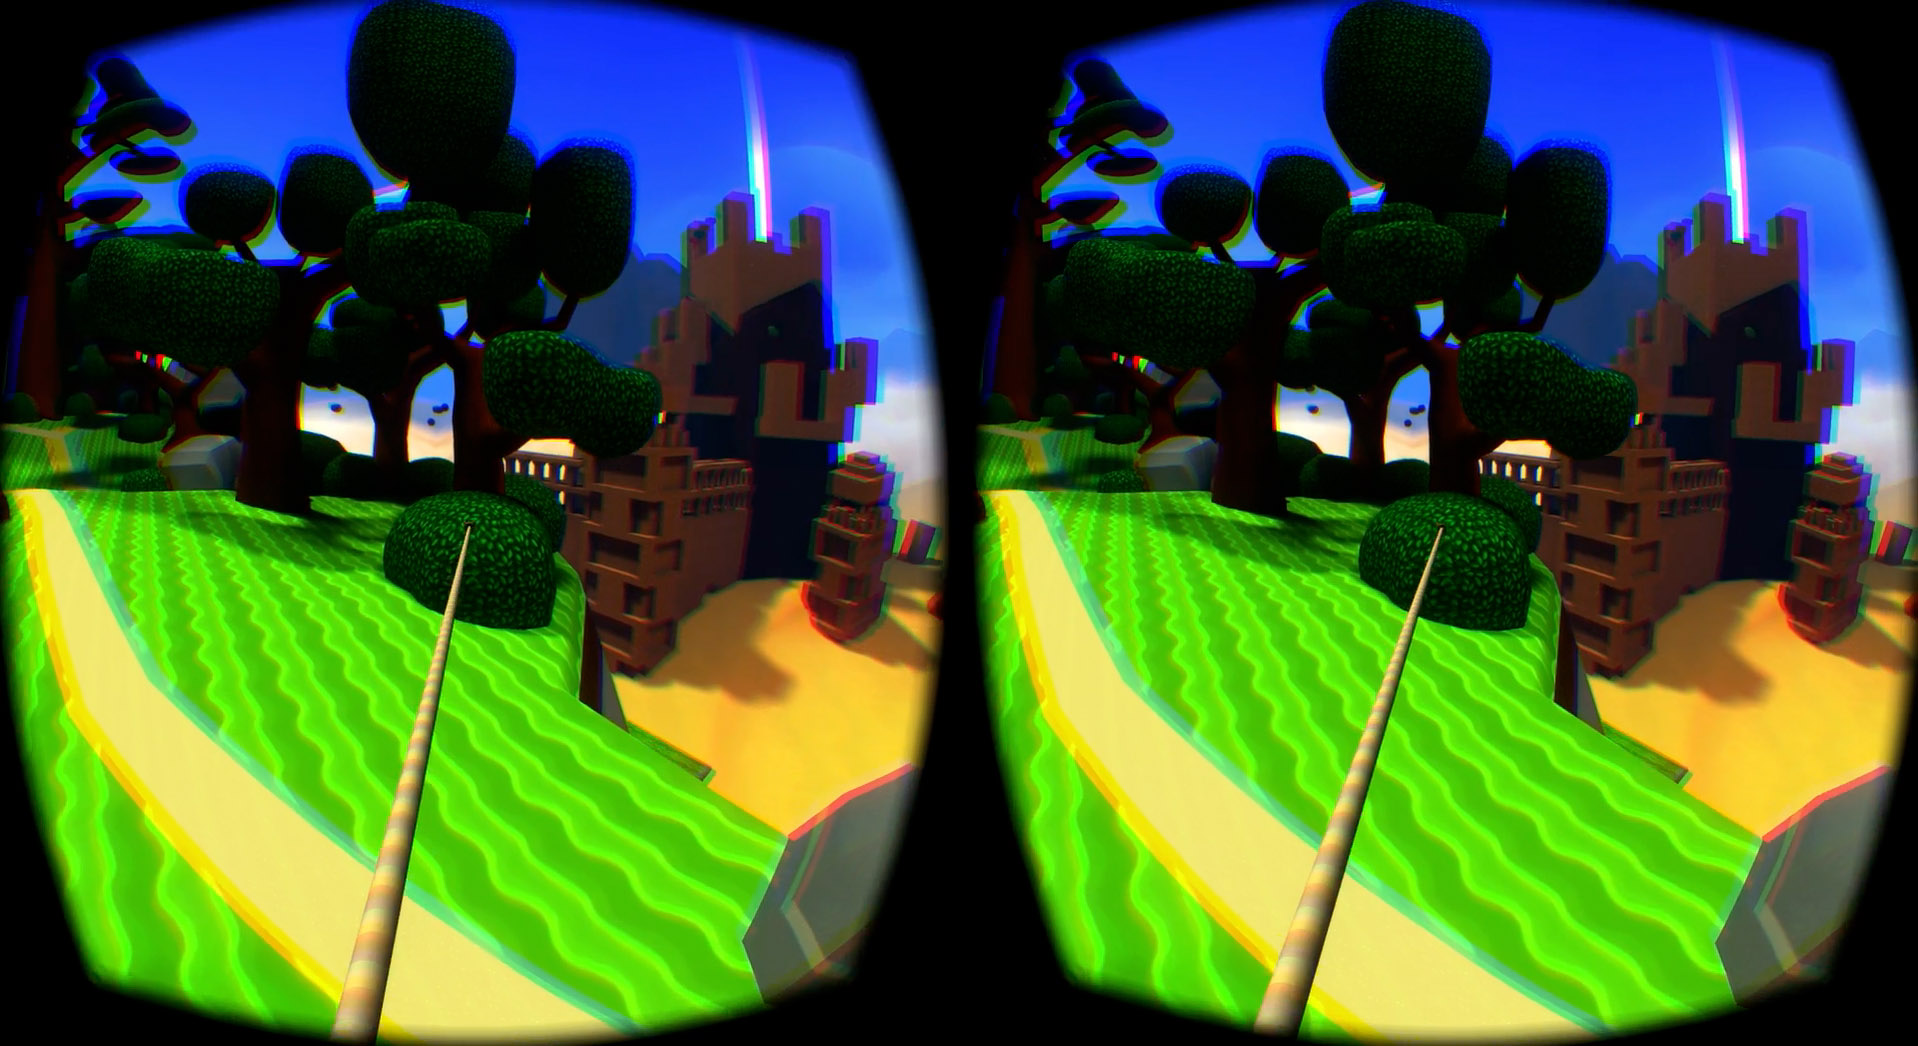 Mejores juegos gratis Oculus Rift